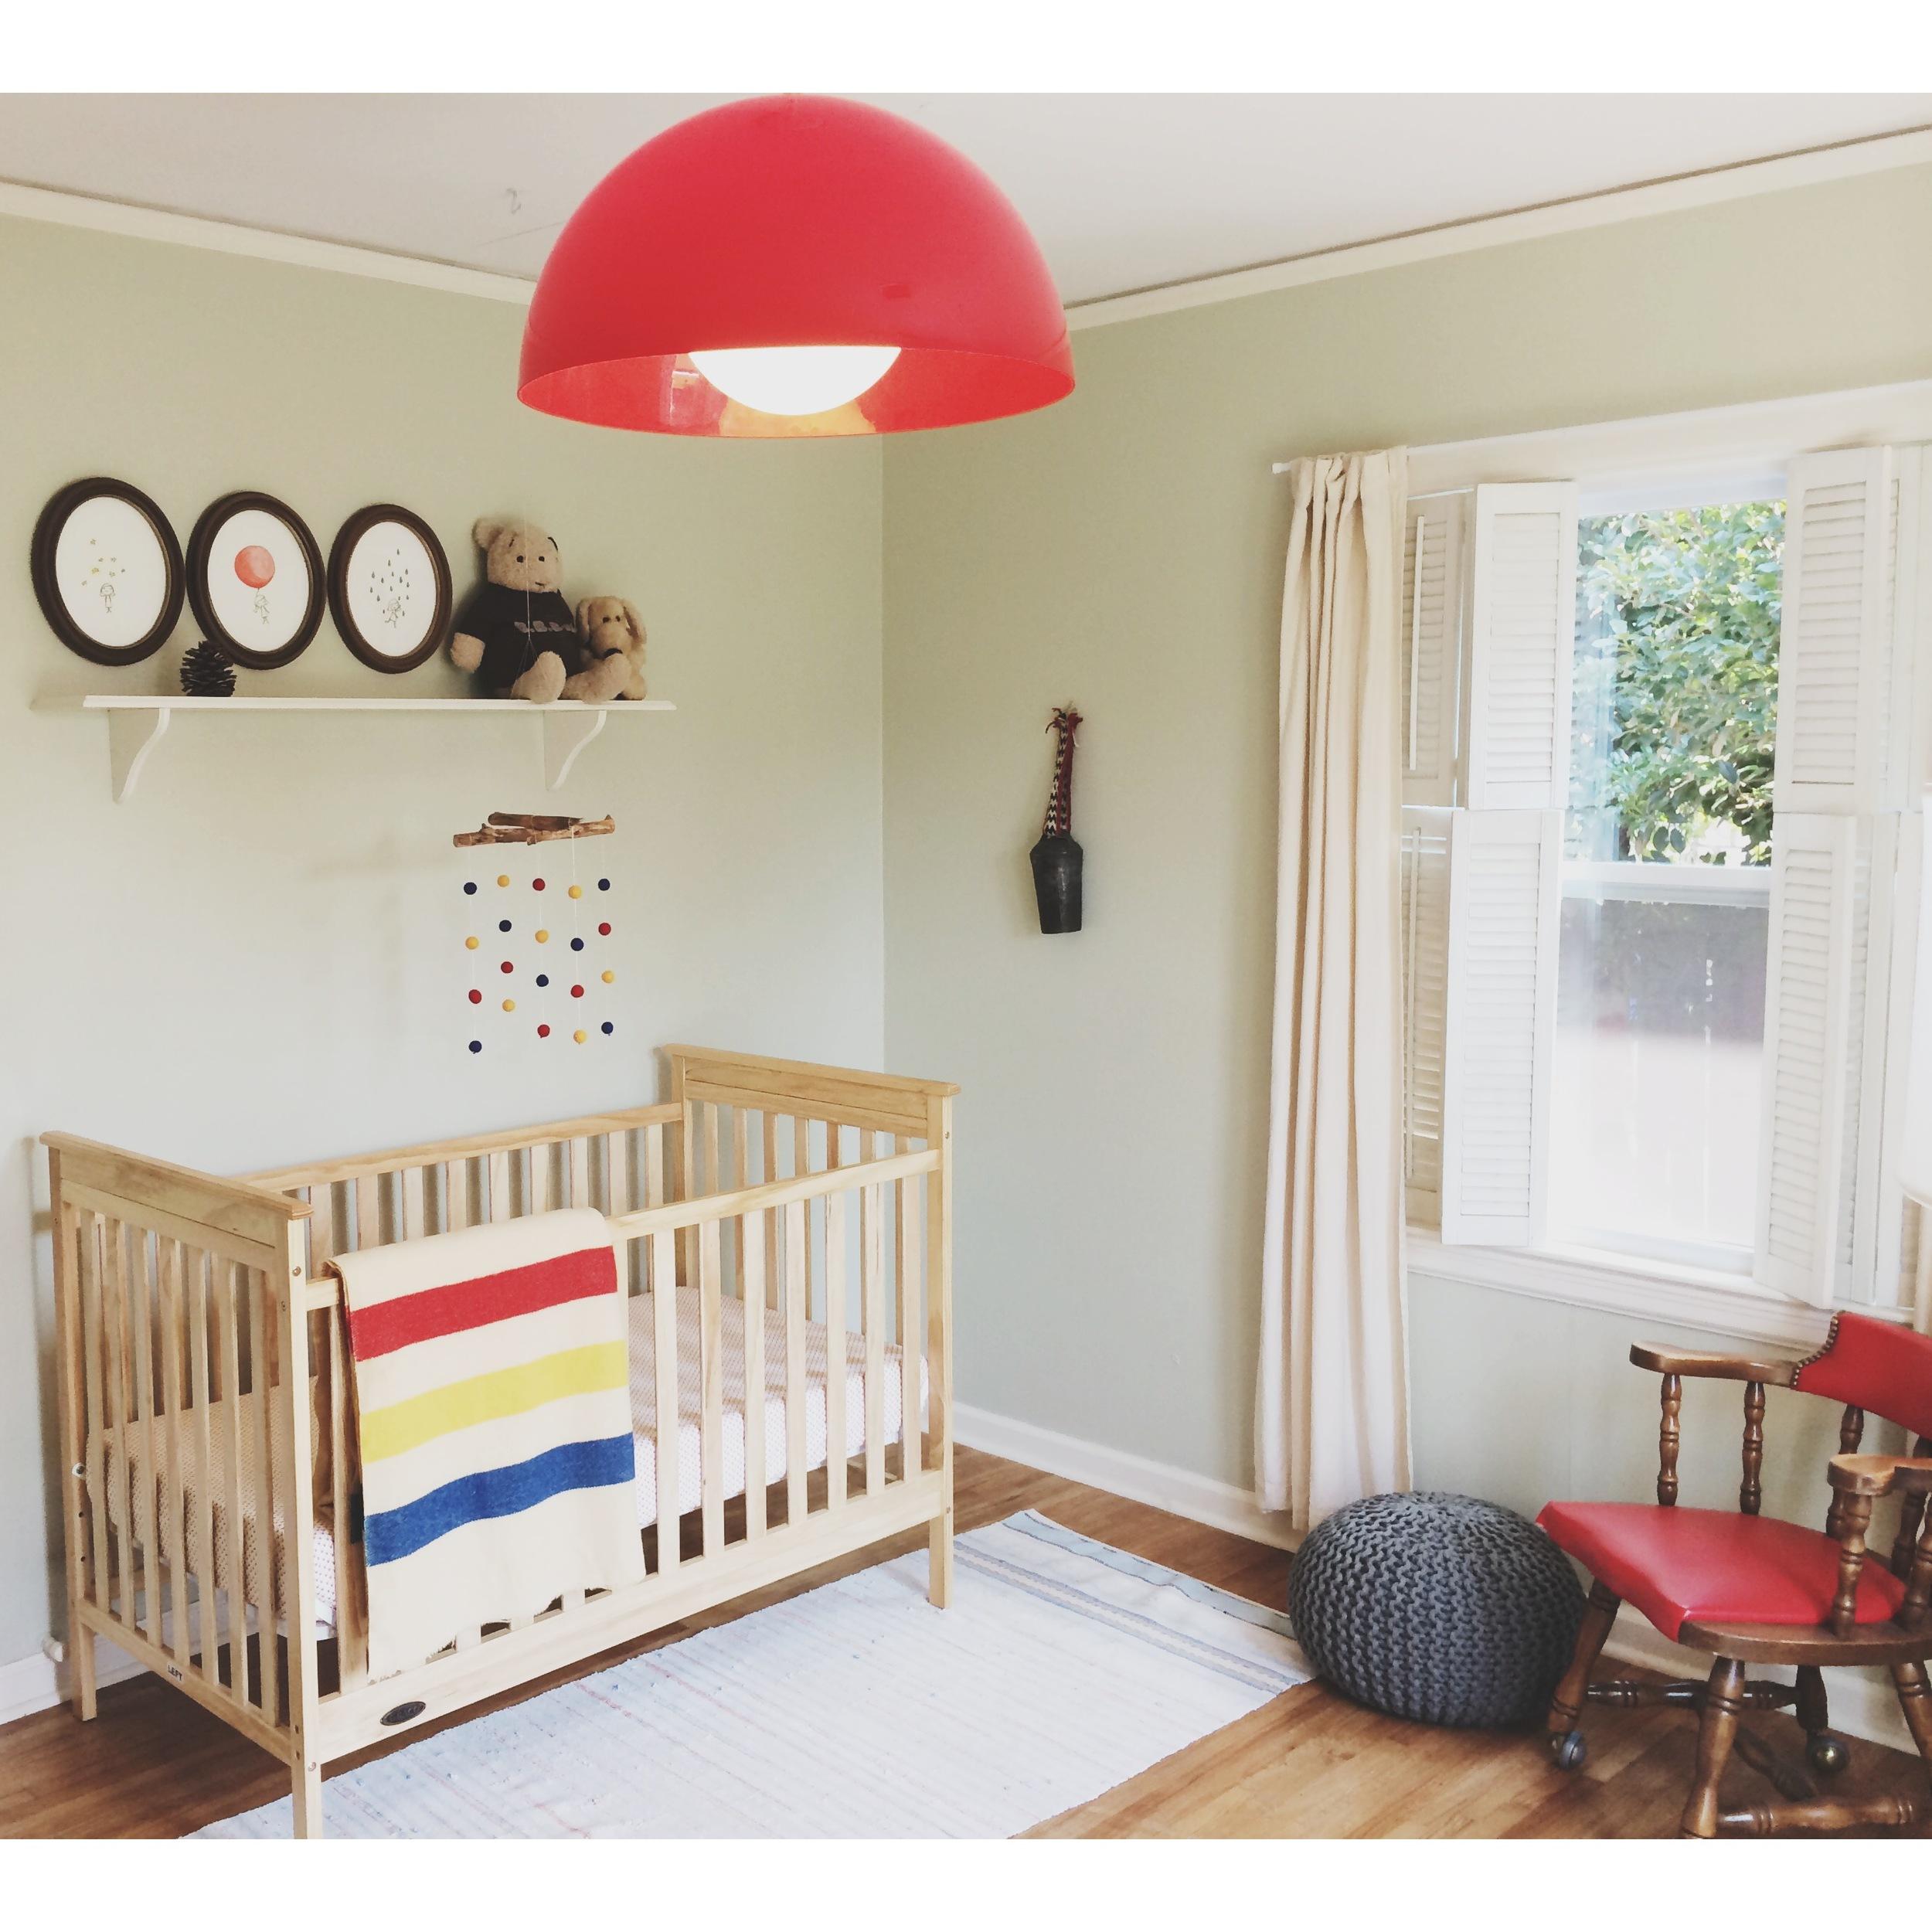 Baby Caroline Janes Vintage Modern Nursery Tour